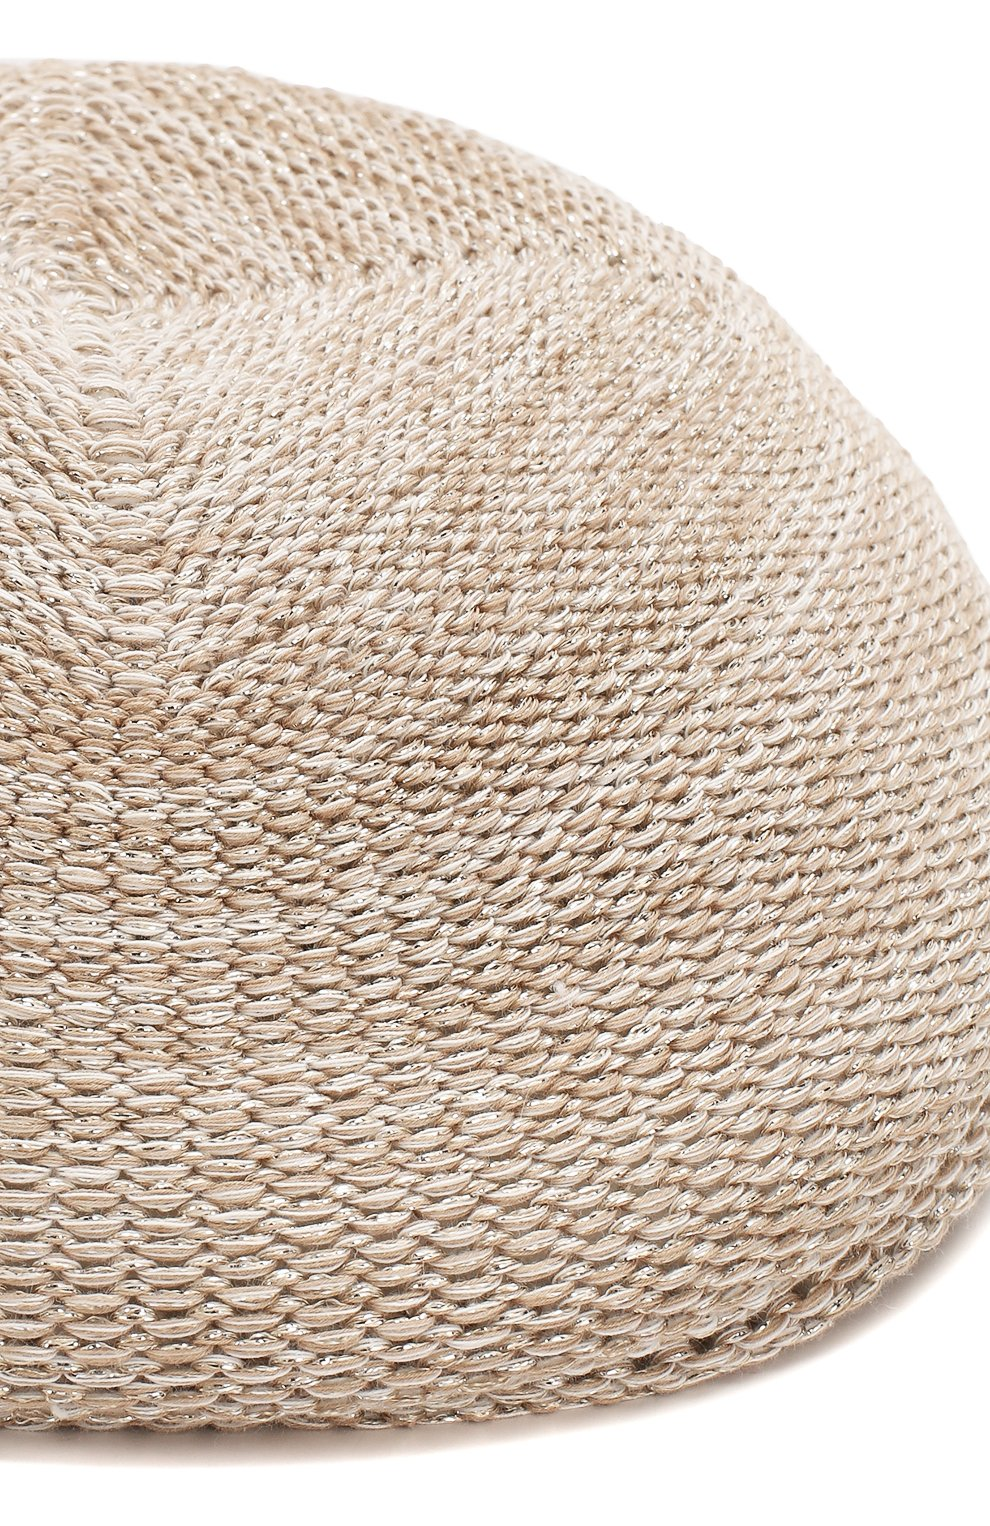 Женская кепи LORENA ANTONIAZZI бежевого цвета, арт. P2097CE001/1329 | Фото 3 (Материал: Текстиль, Хлопок)